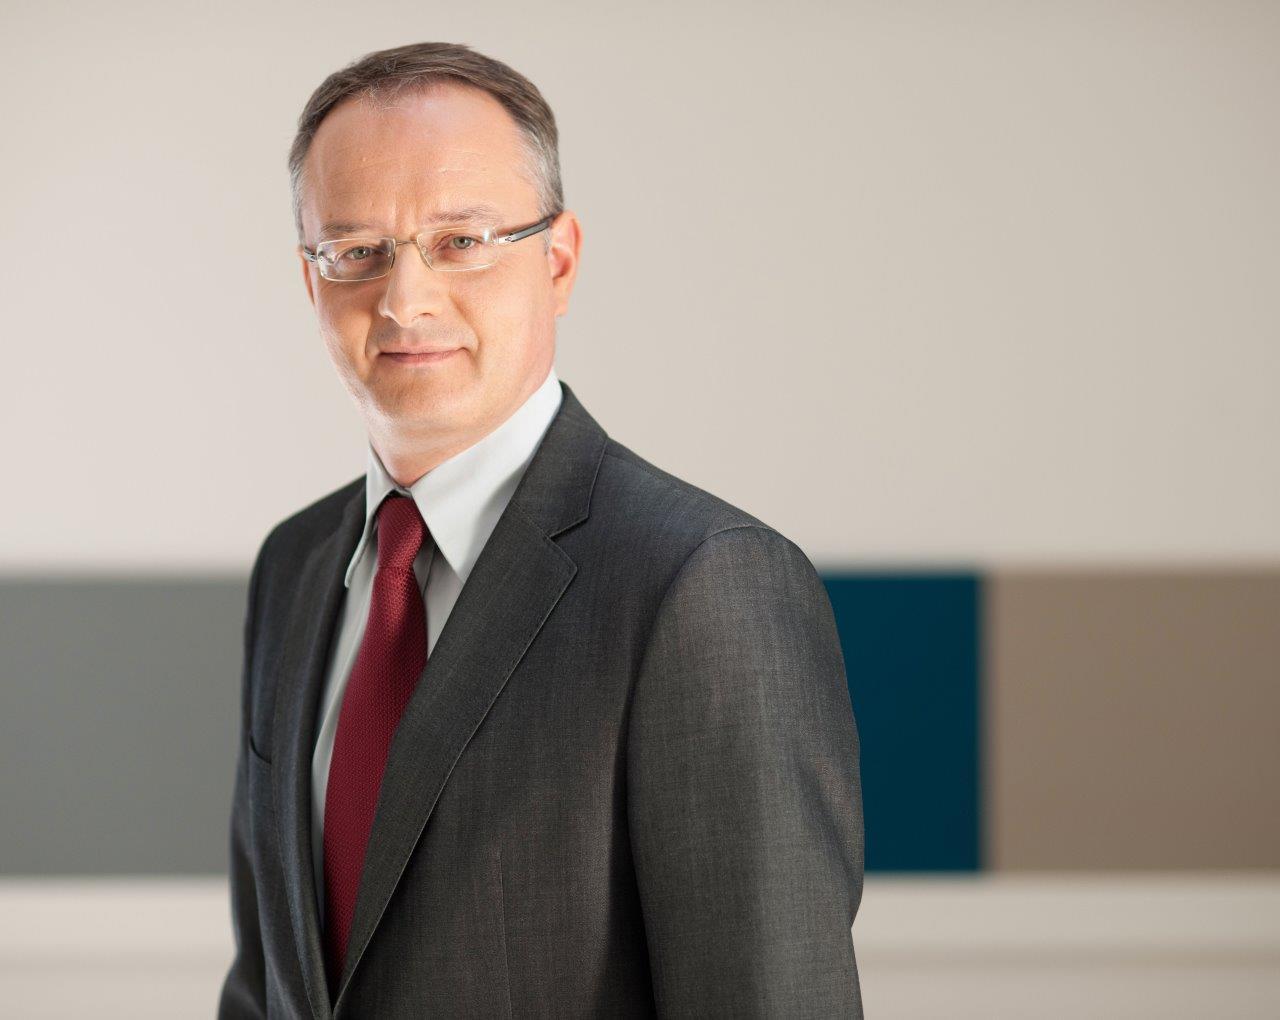 Ist sauer: Baden-Württembergs Kultusminister Stoch. (Foto: PR/Landesregierung BW)